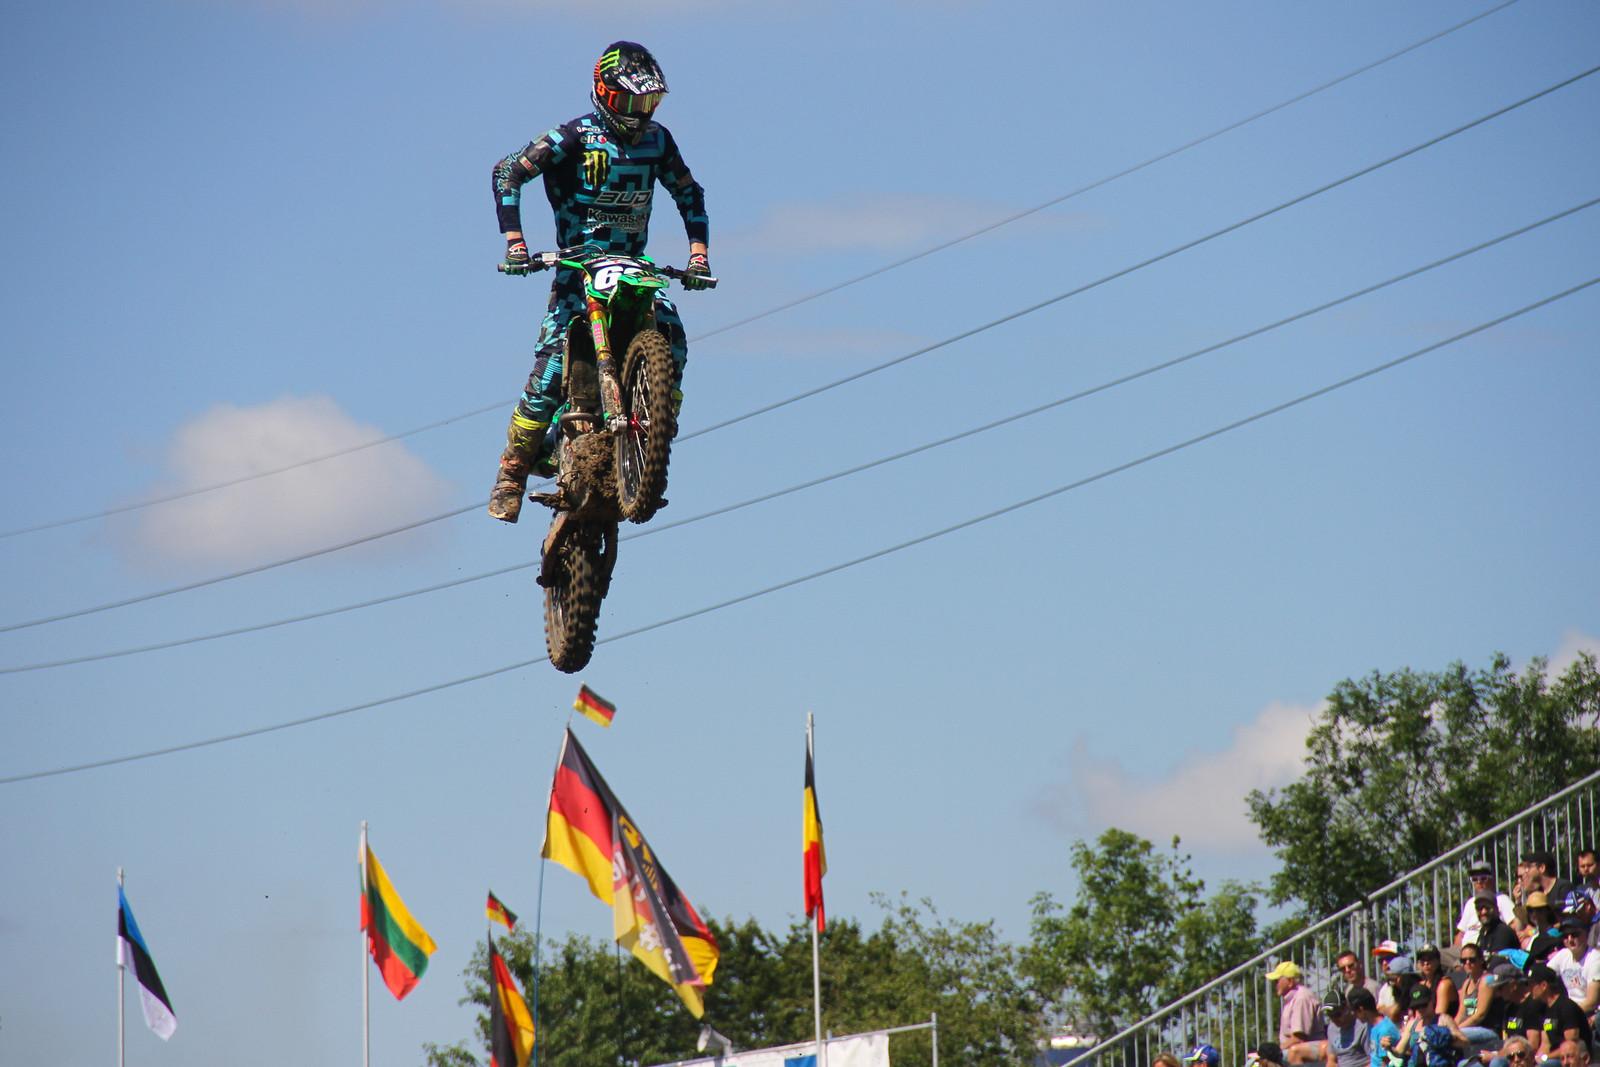 Tristan Charboneau - ayearinmx - Motocross Pictures - Vital MX